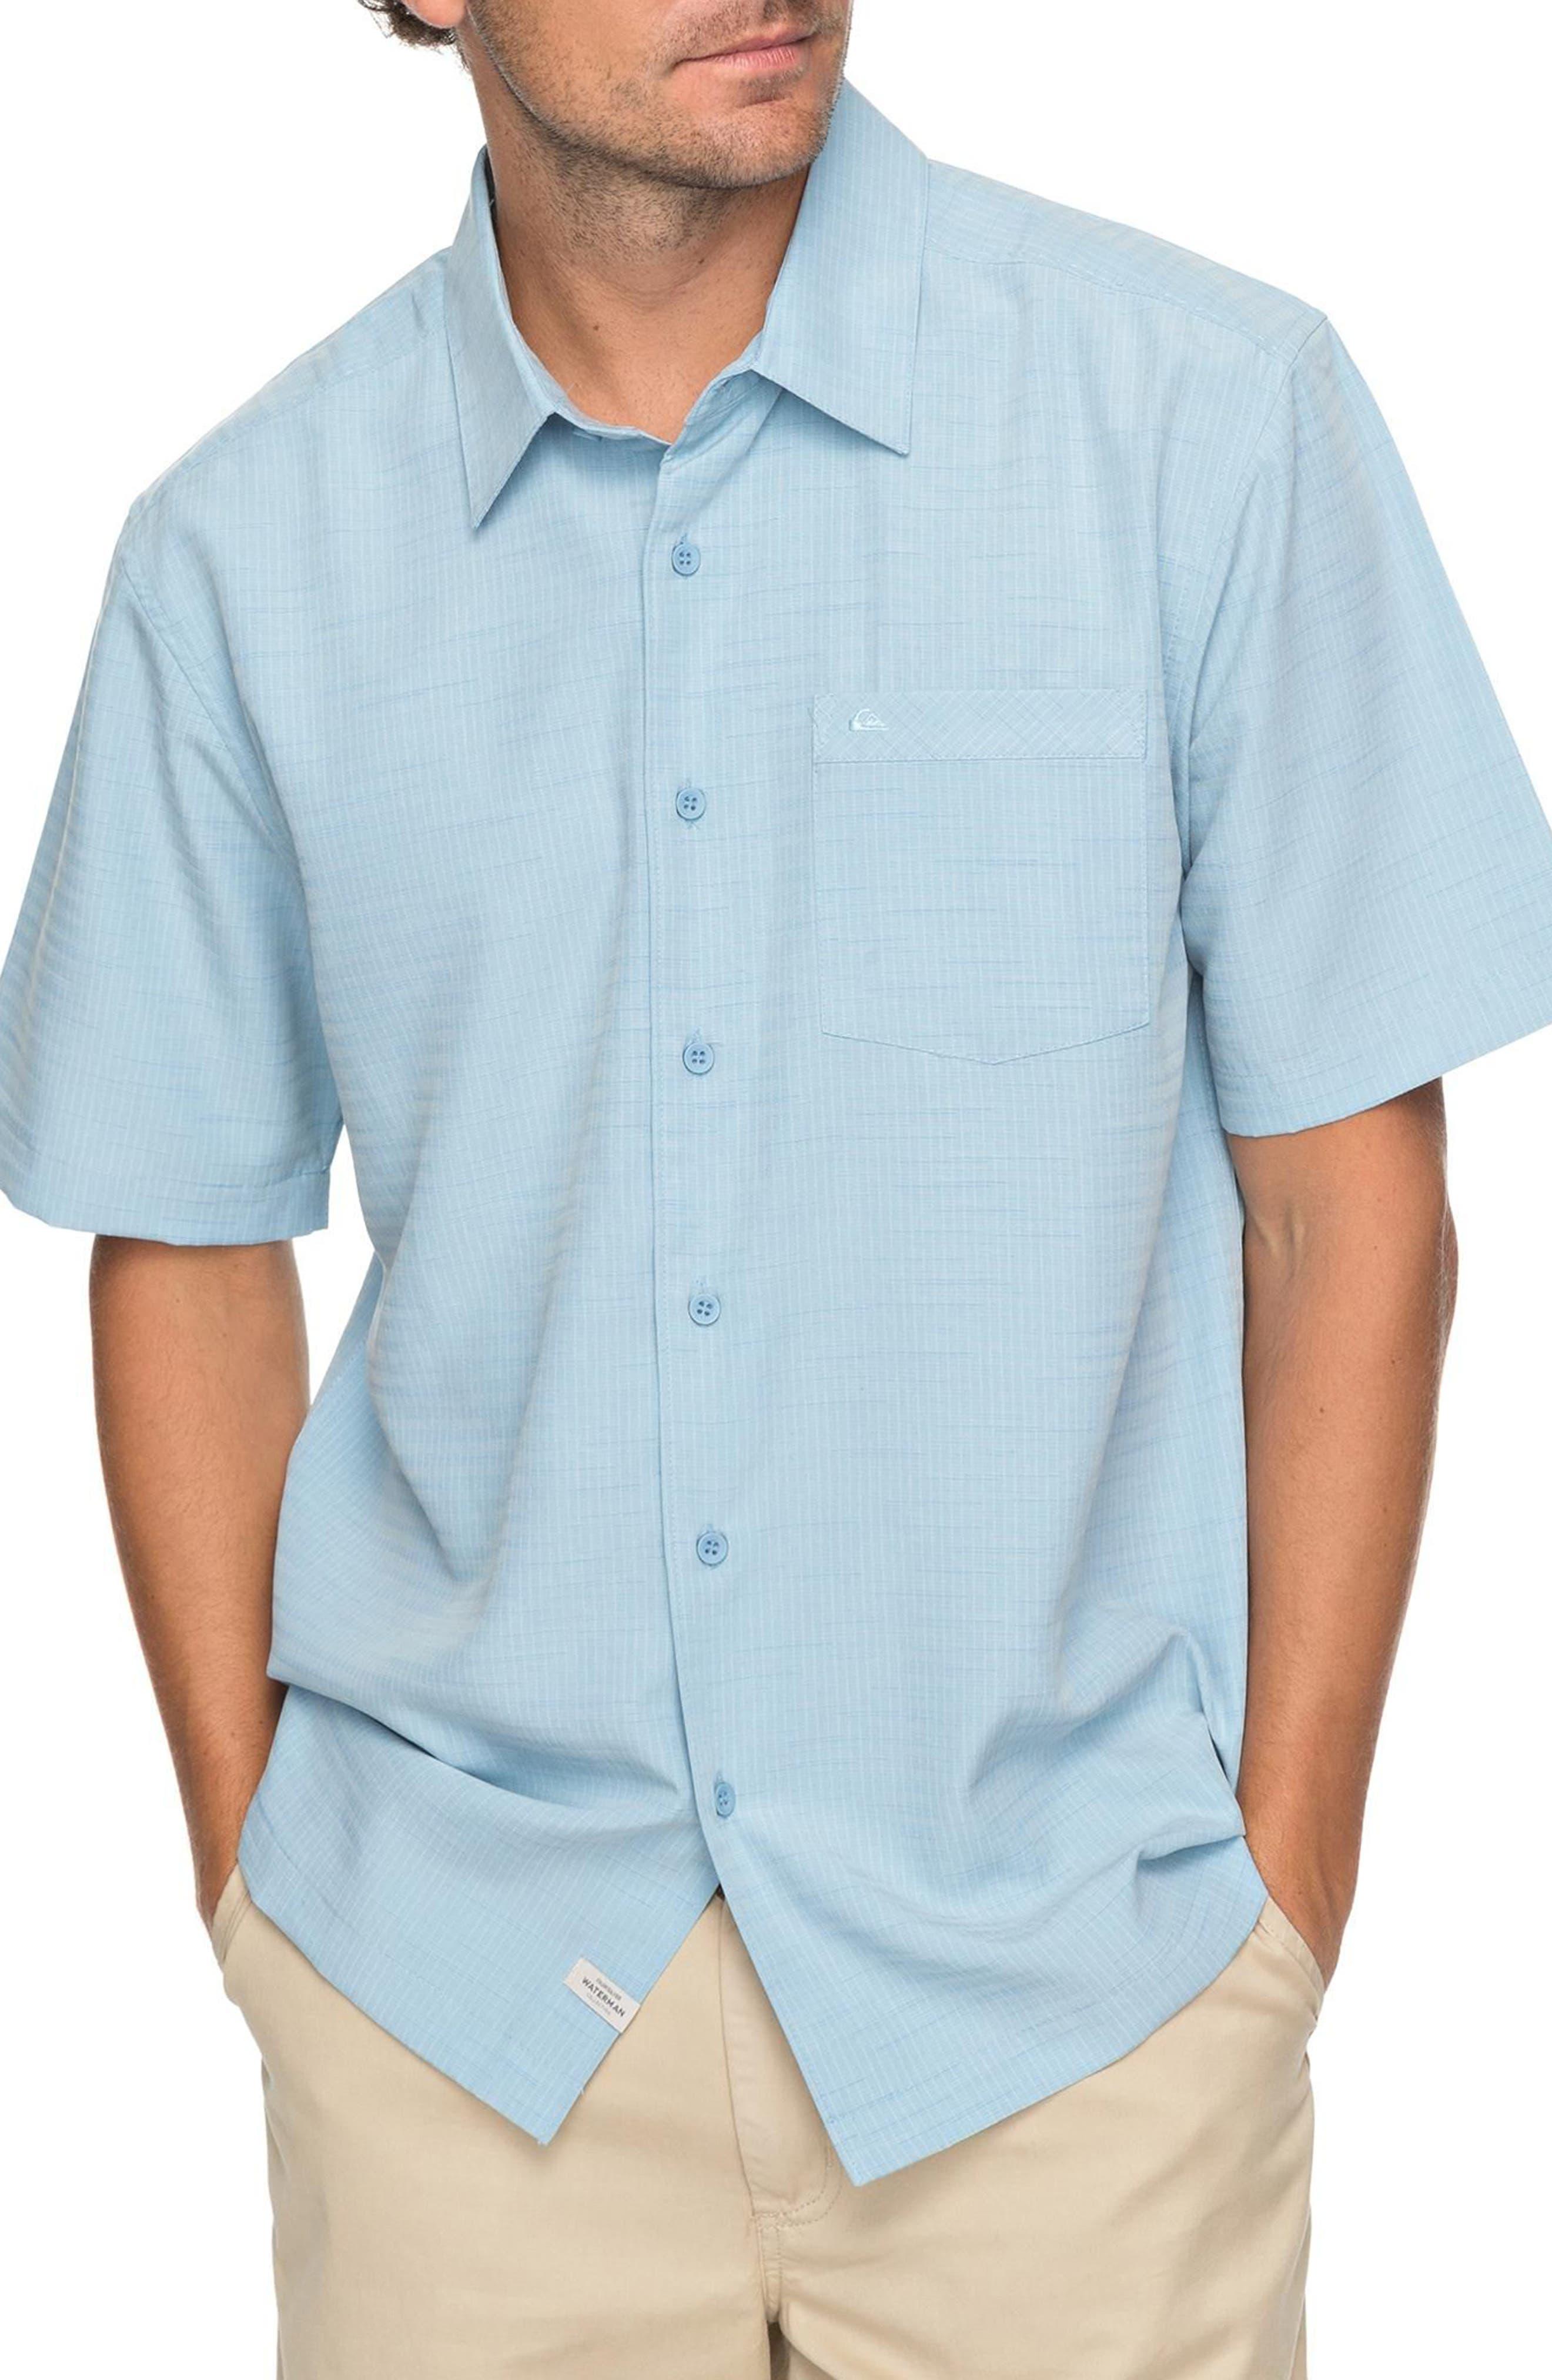 Alternate Image 1 Selected - Quiksilver Waterman Collection Centinala Shirt